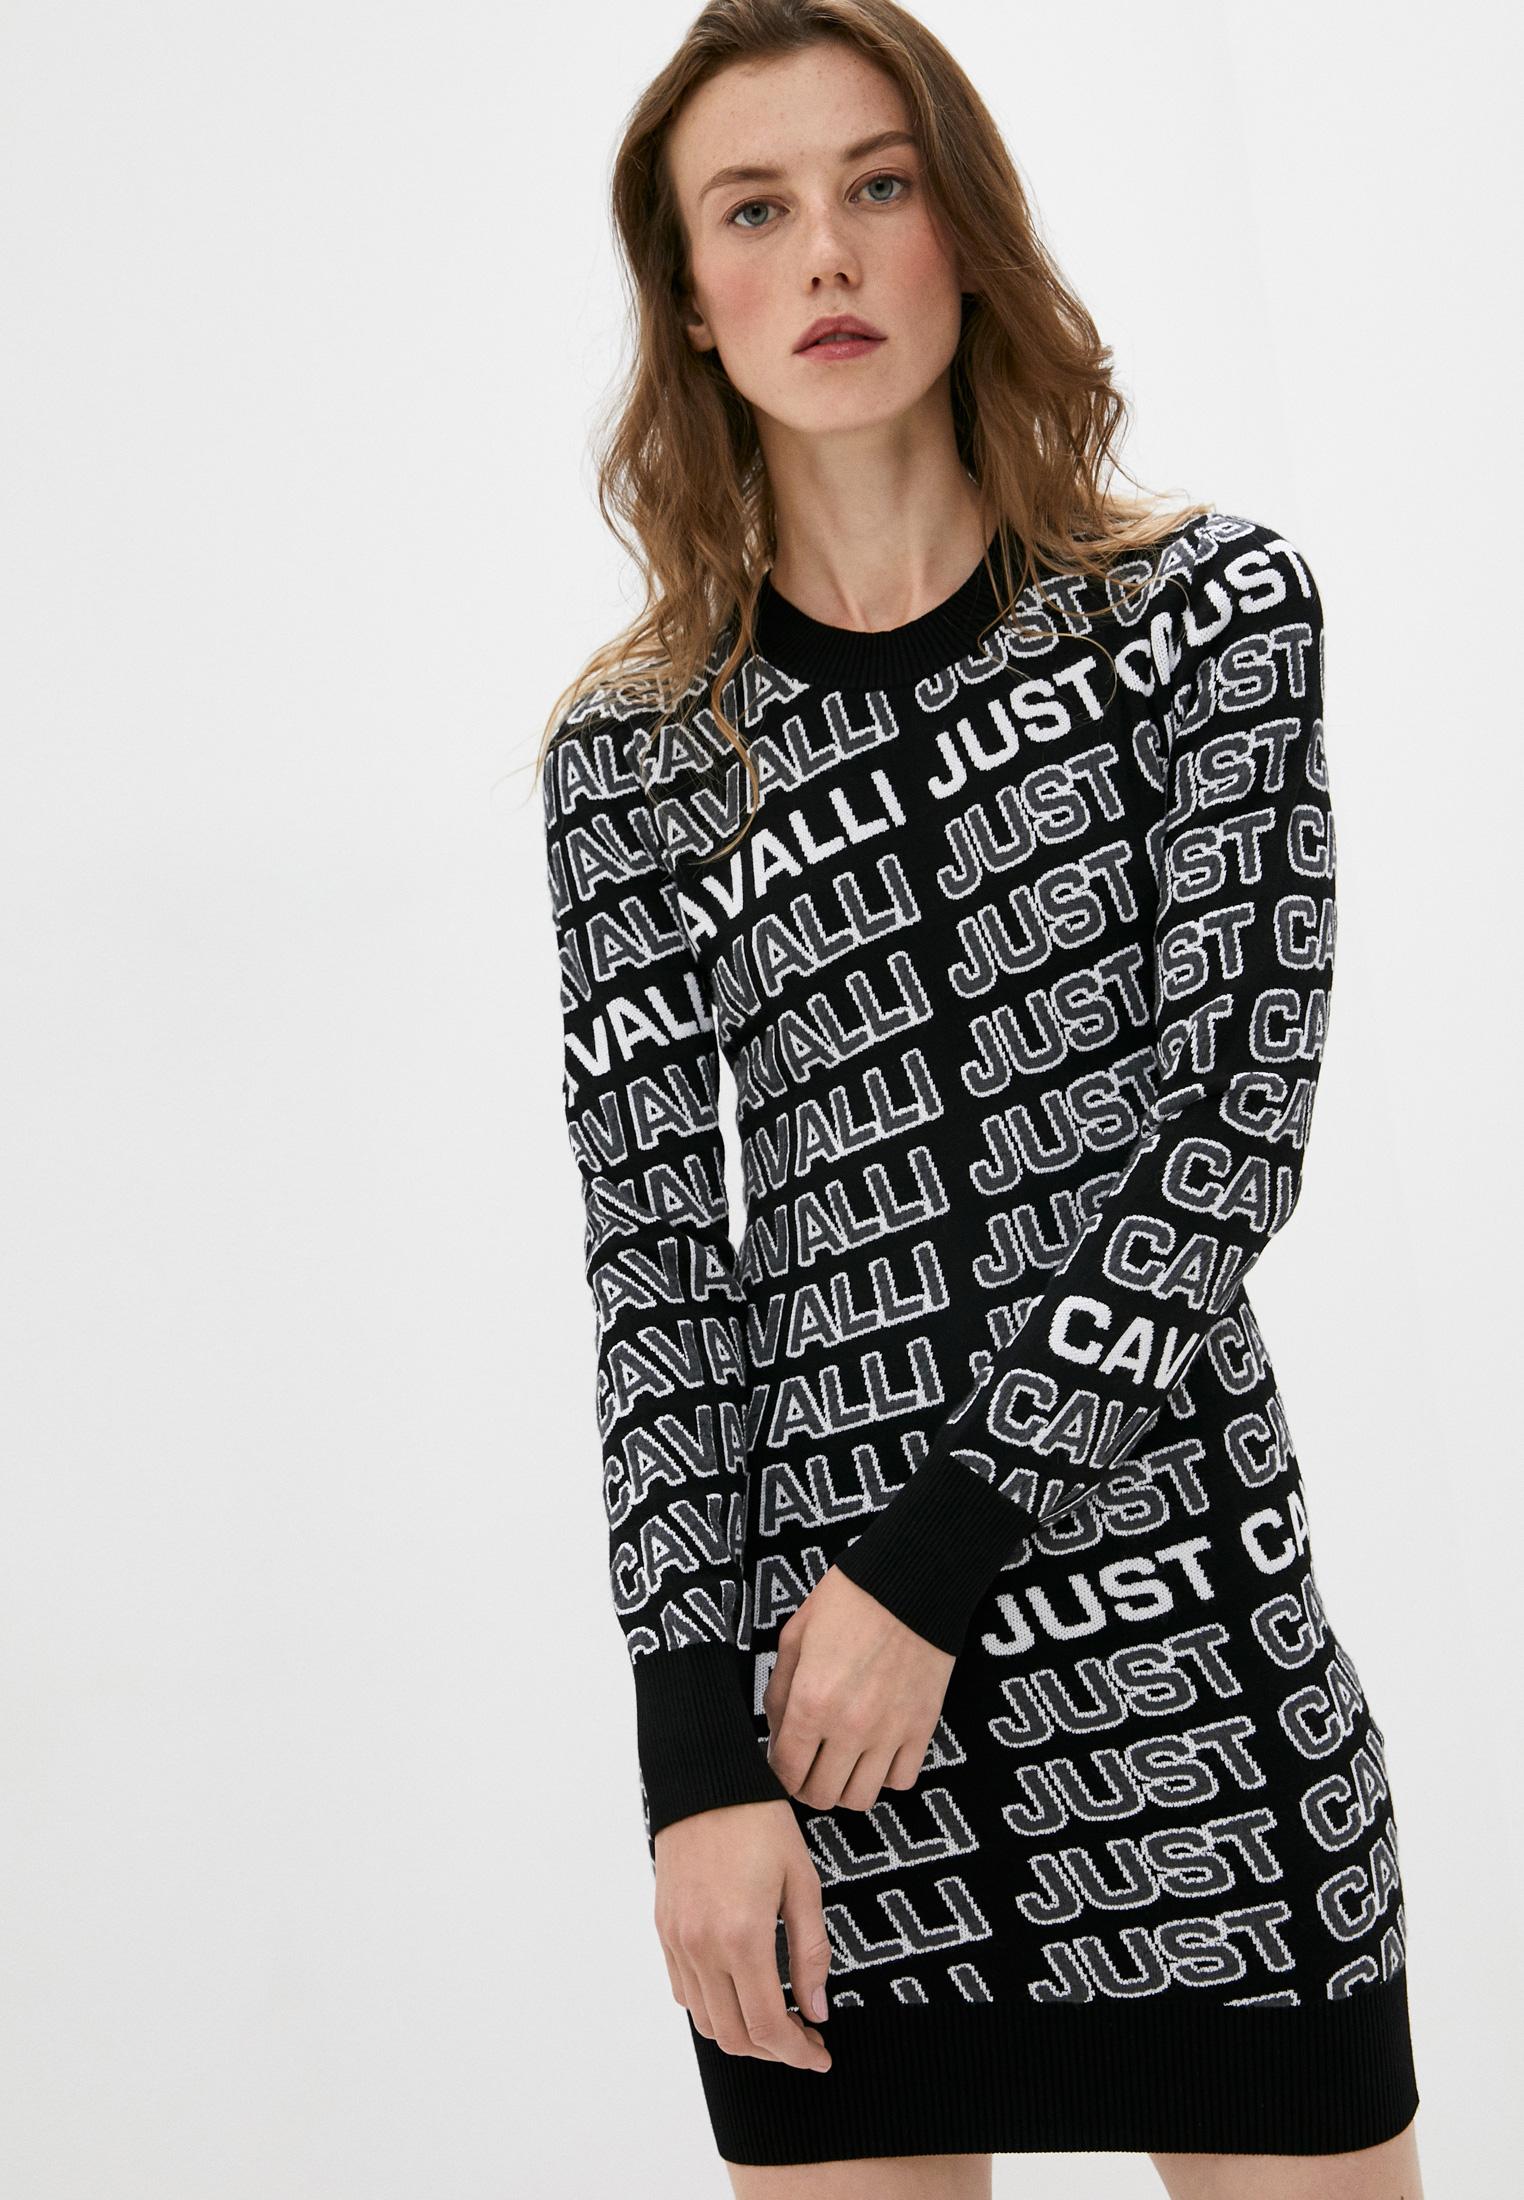 Вязаное платье Just Cavalli (Джаст Кавалли) Платье Just Cavalli